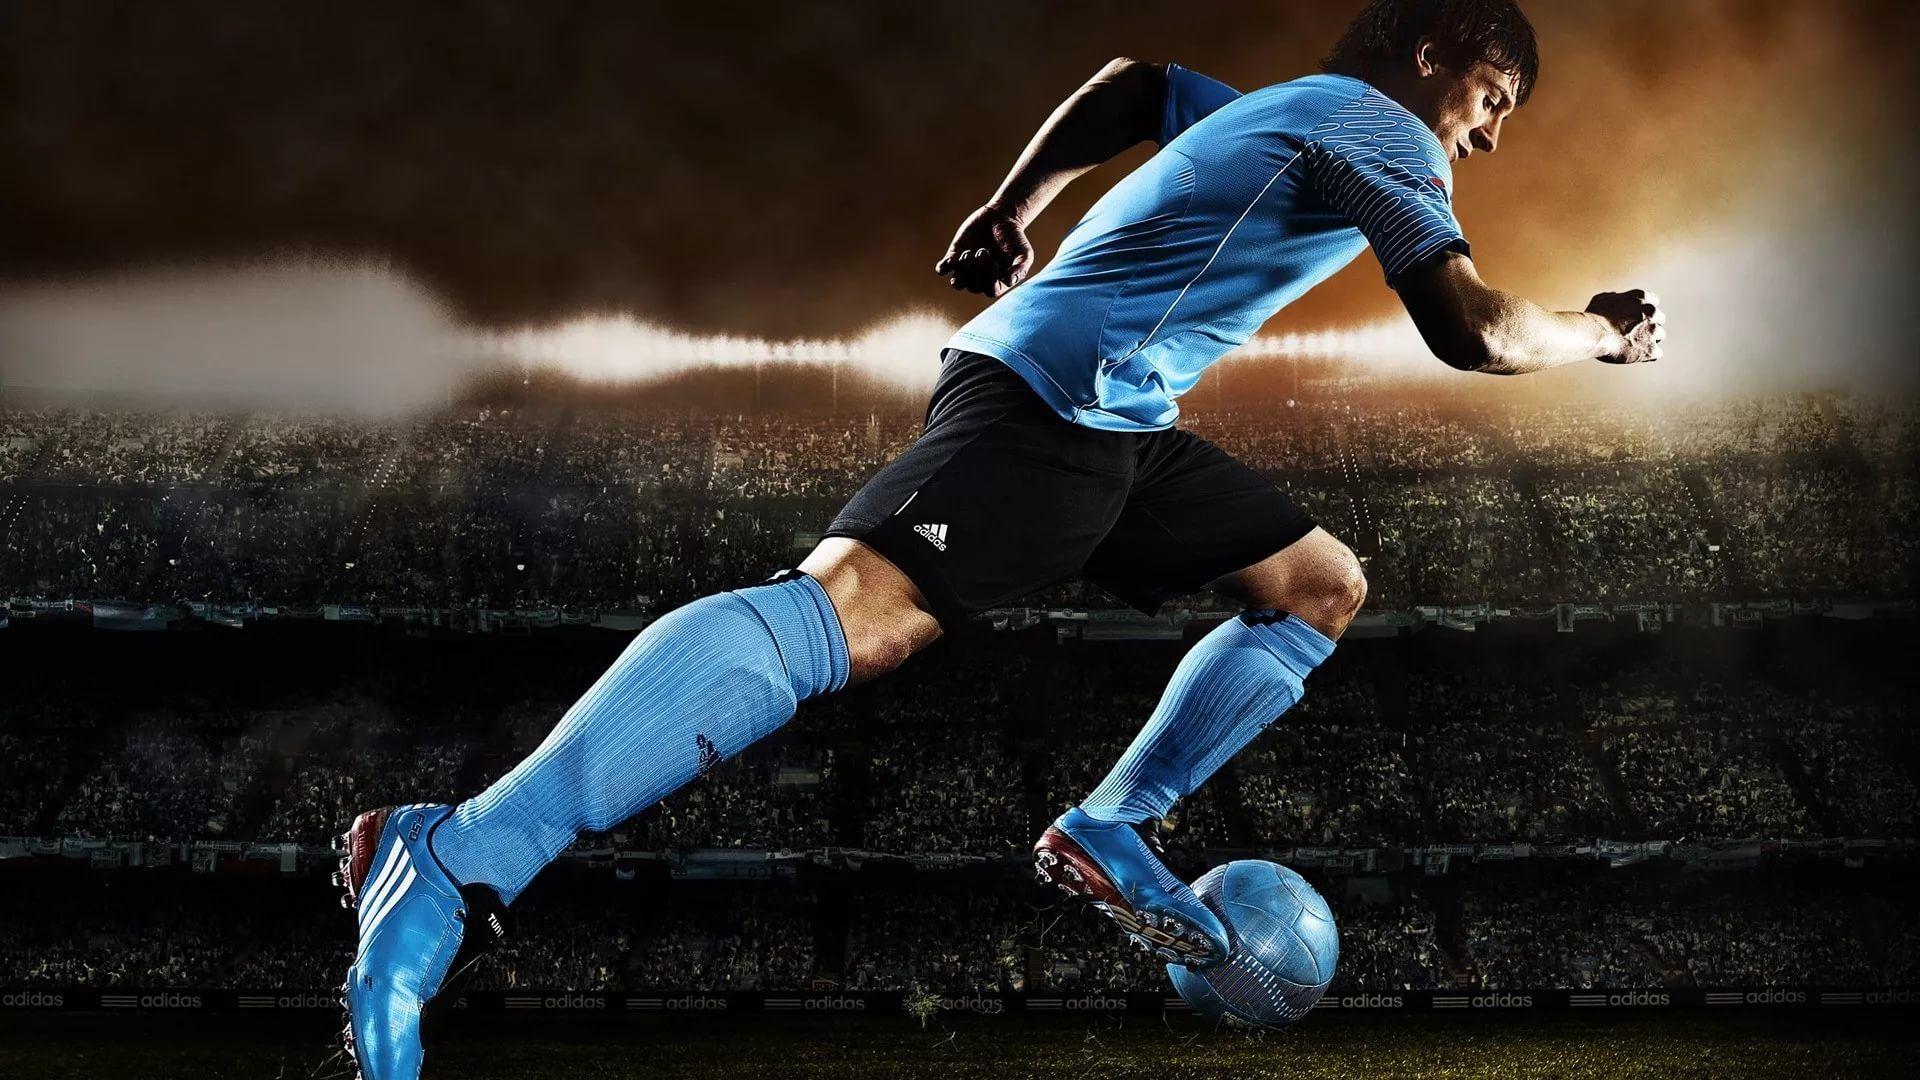 Soccer Player wallpaper theme